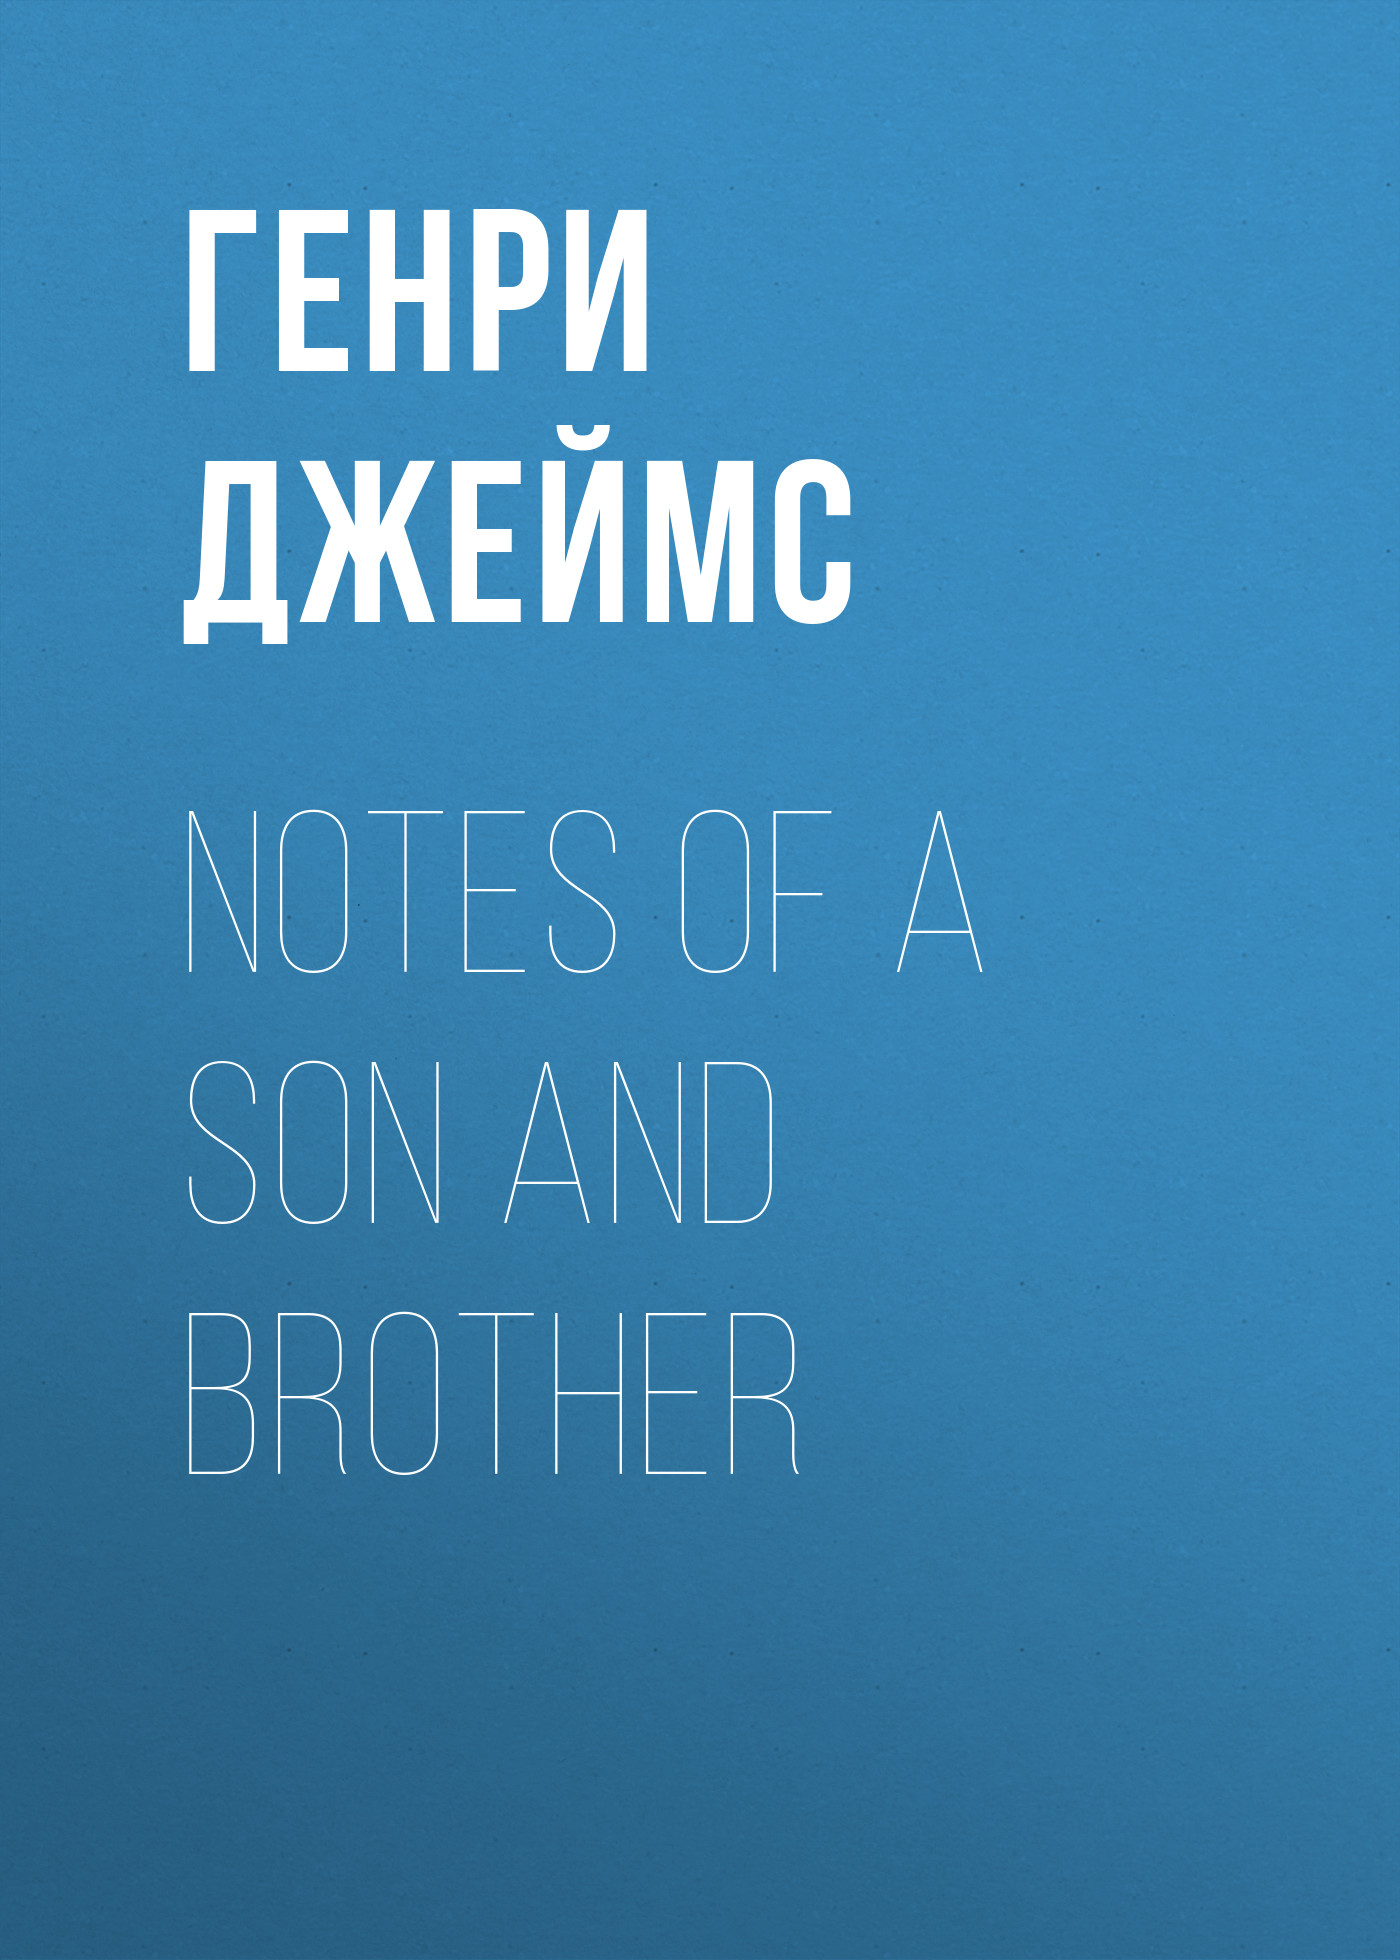 Фото - Генри Джеймс Notes of a Son and Brother джеймс а холл юнгианское толкование сновидений практическое руководство